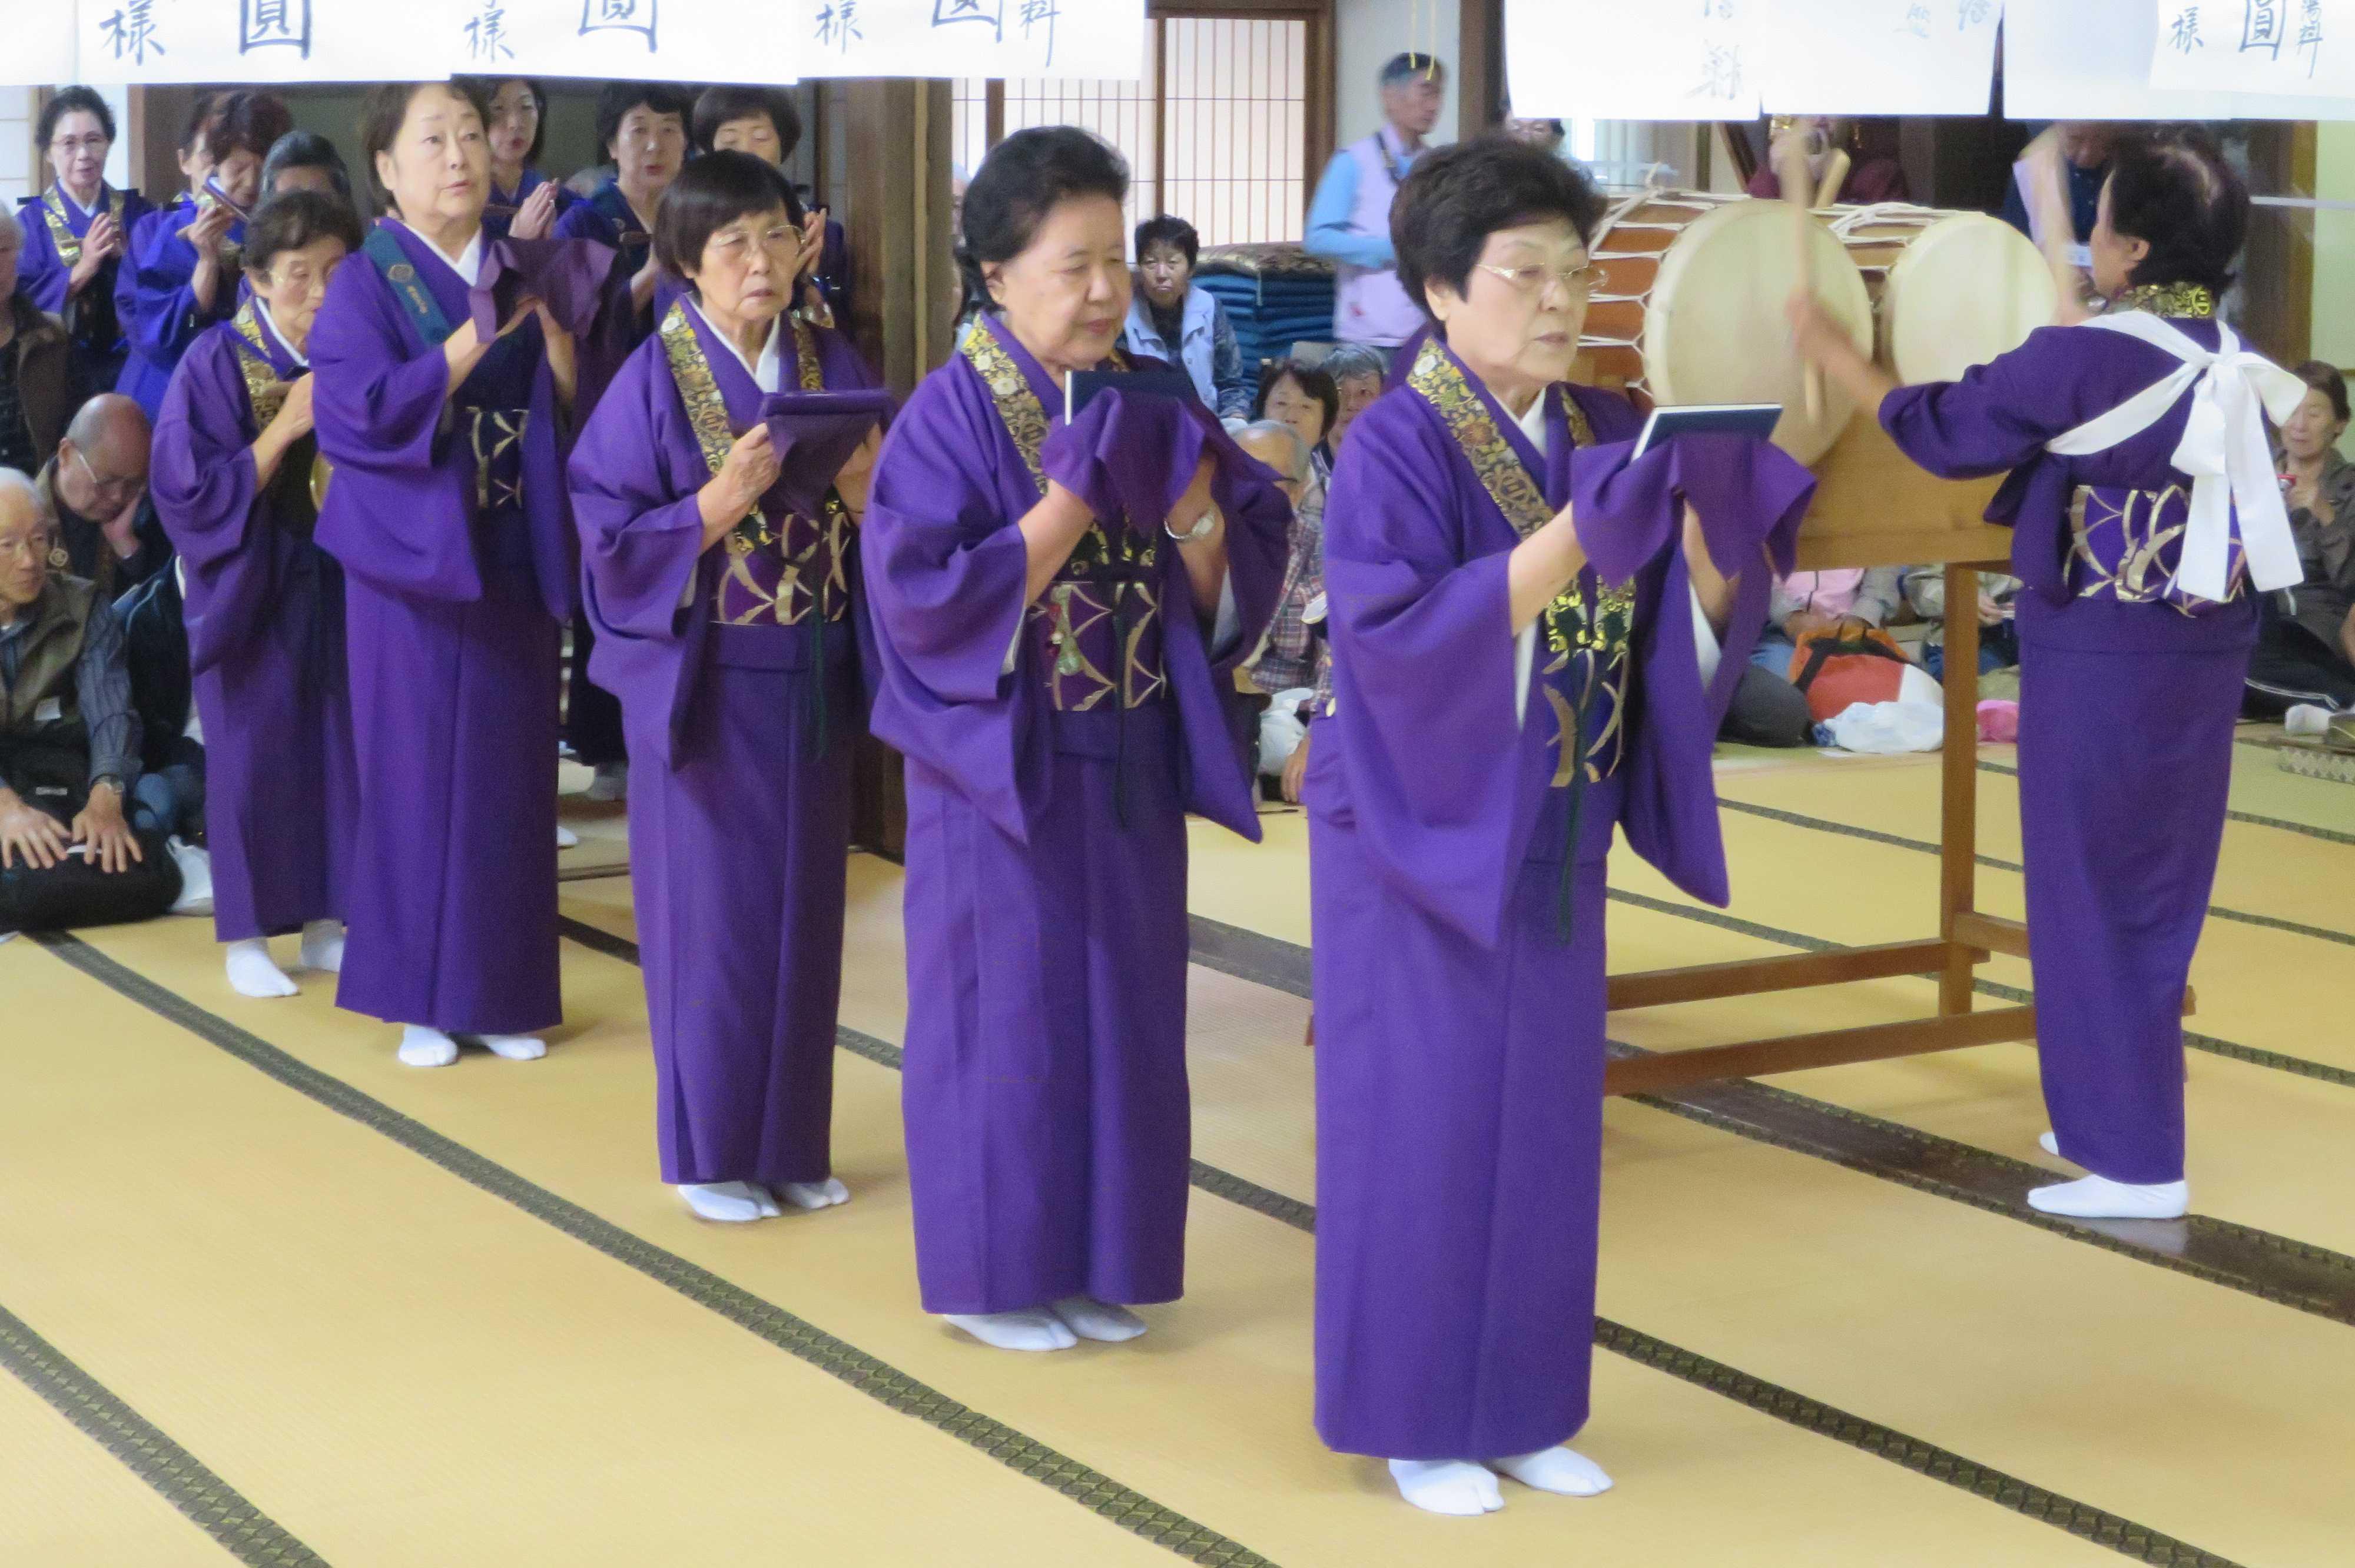 無量光寺の踊り念仏 - 唱名(南無阿弥陀仏)